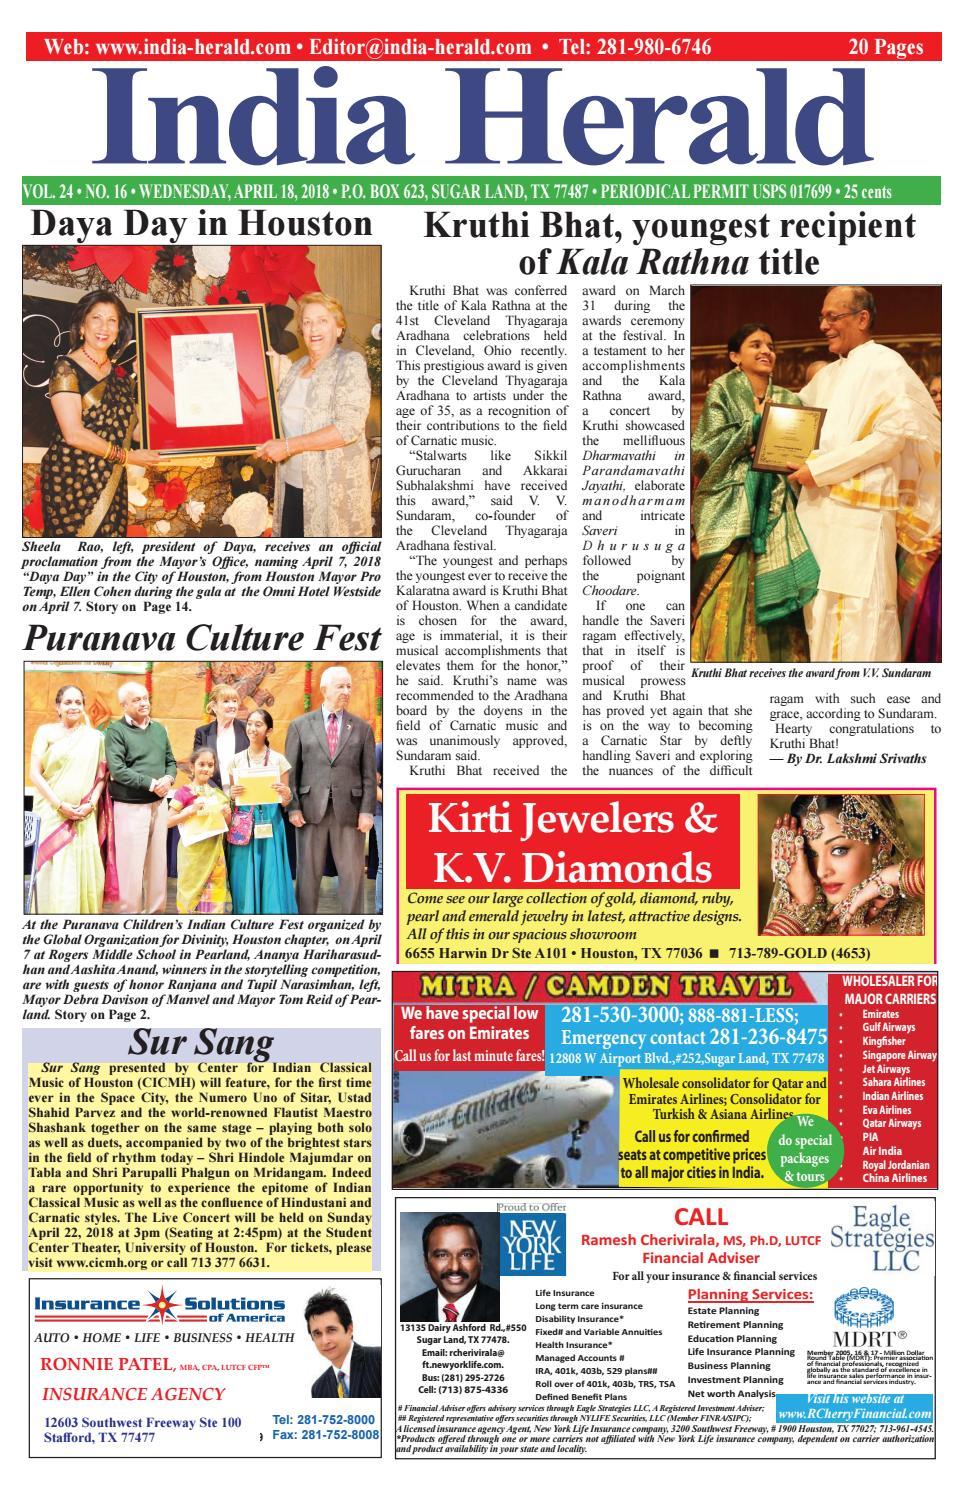 Binder041818 by India Herald - issuu